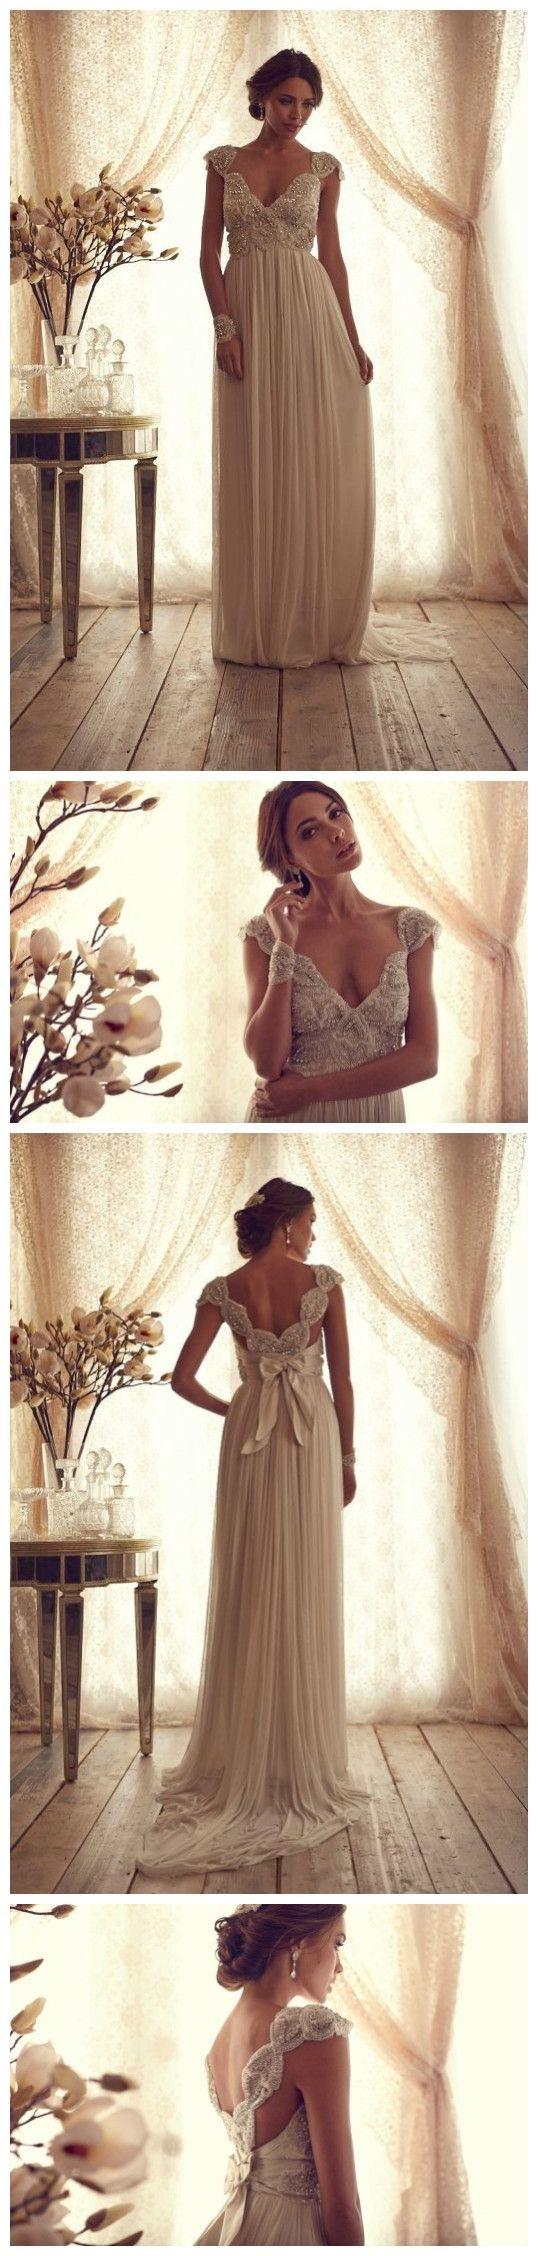 robe-mariage-13